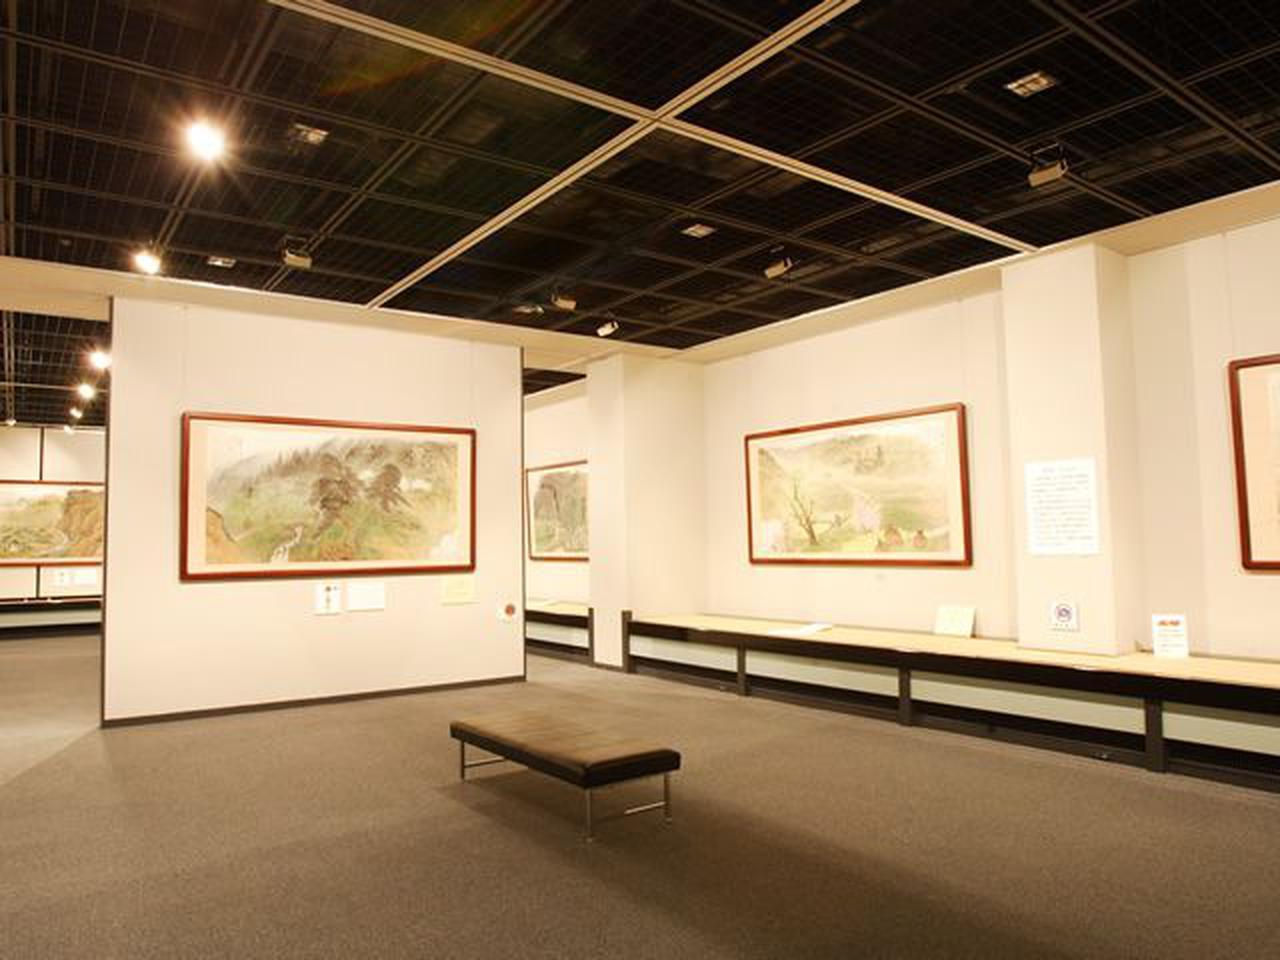 「日本初の貴重な出土品、松帆銅鐸」を特別展示 玉青館